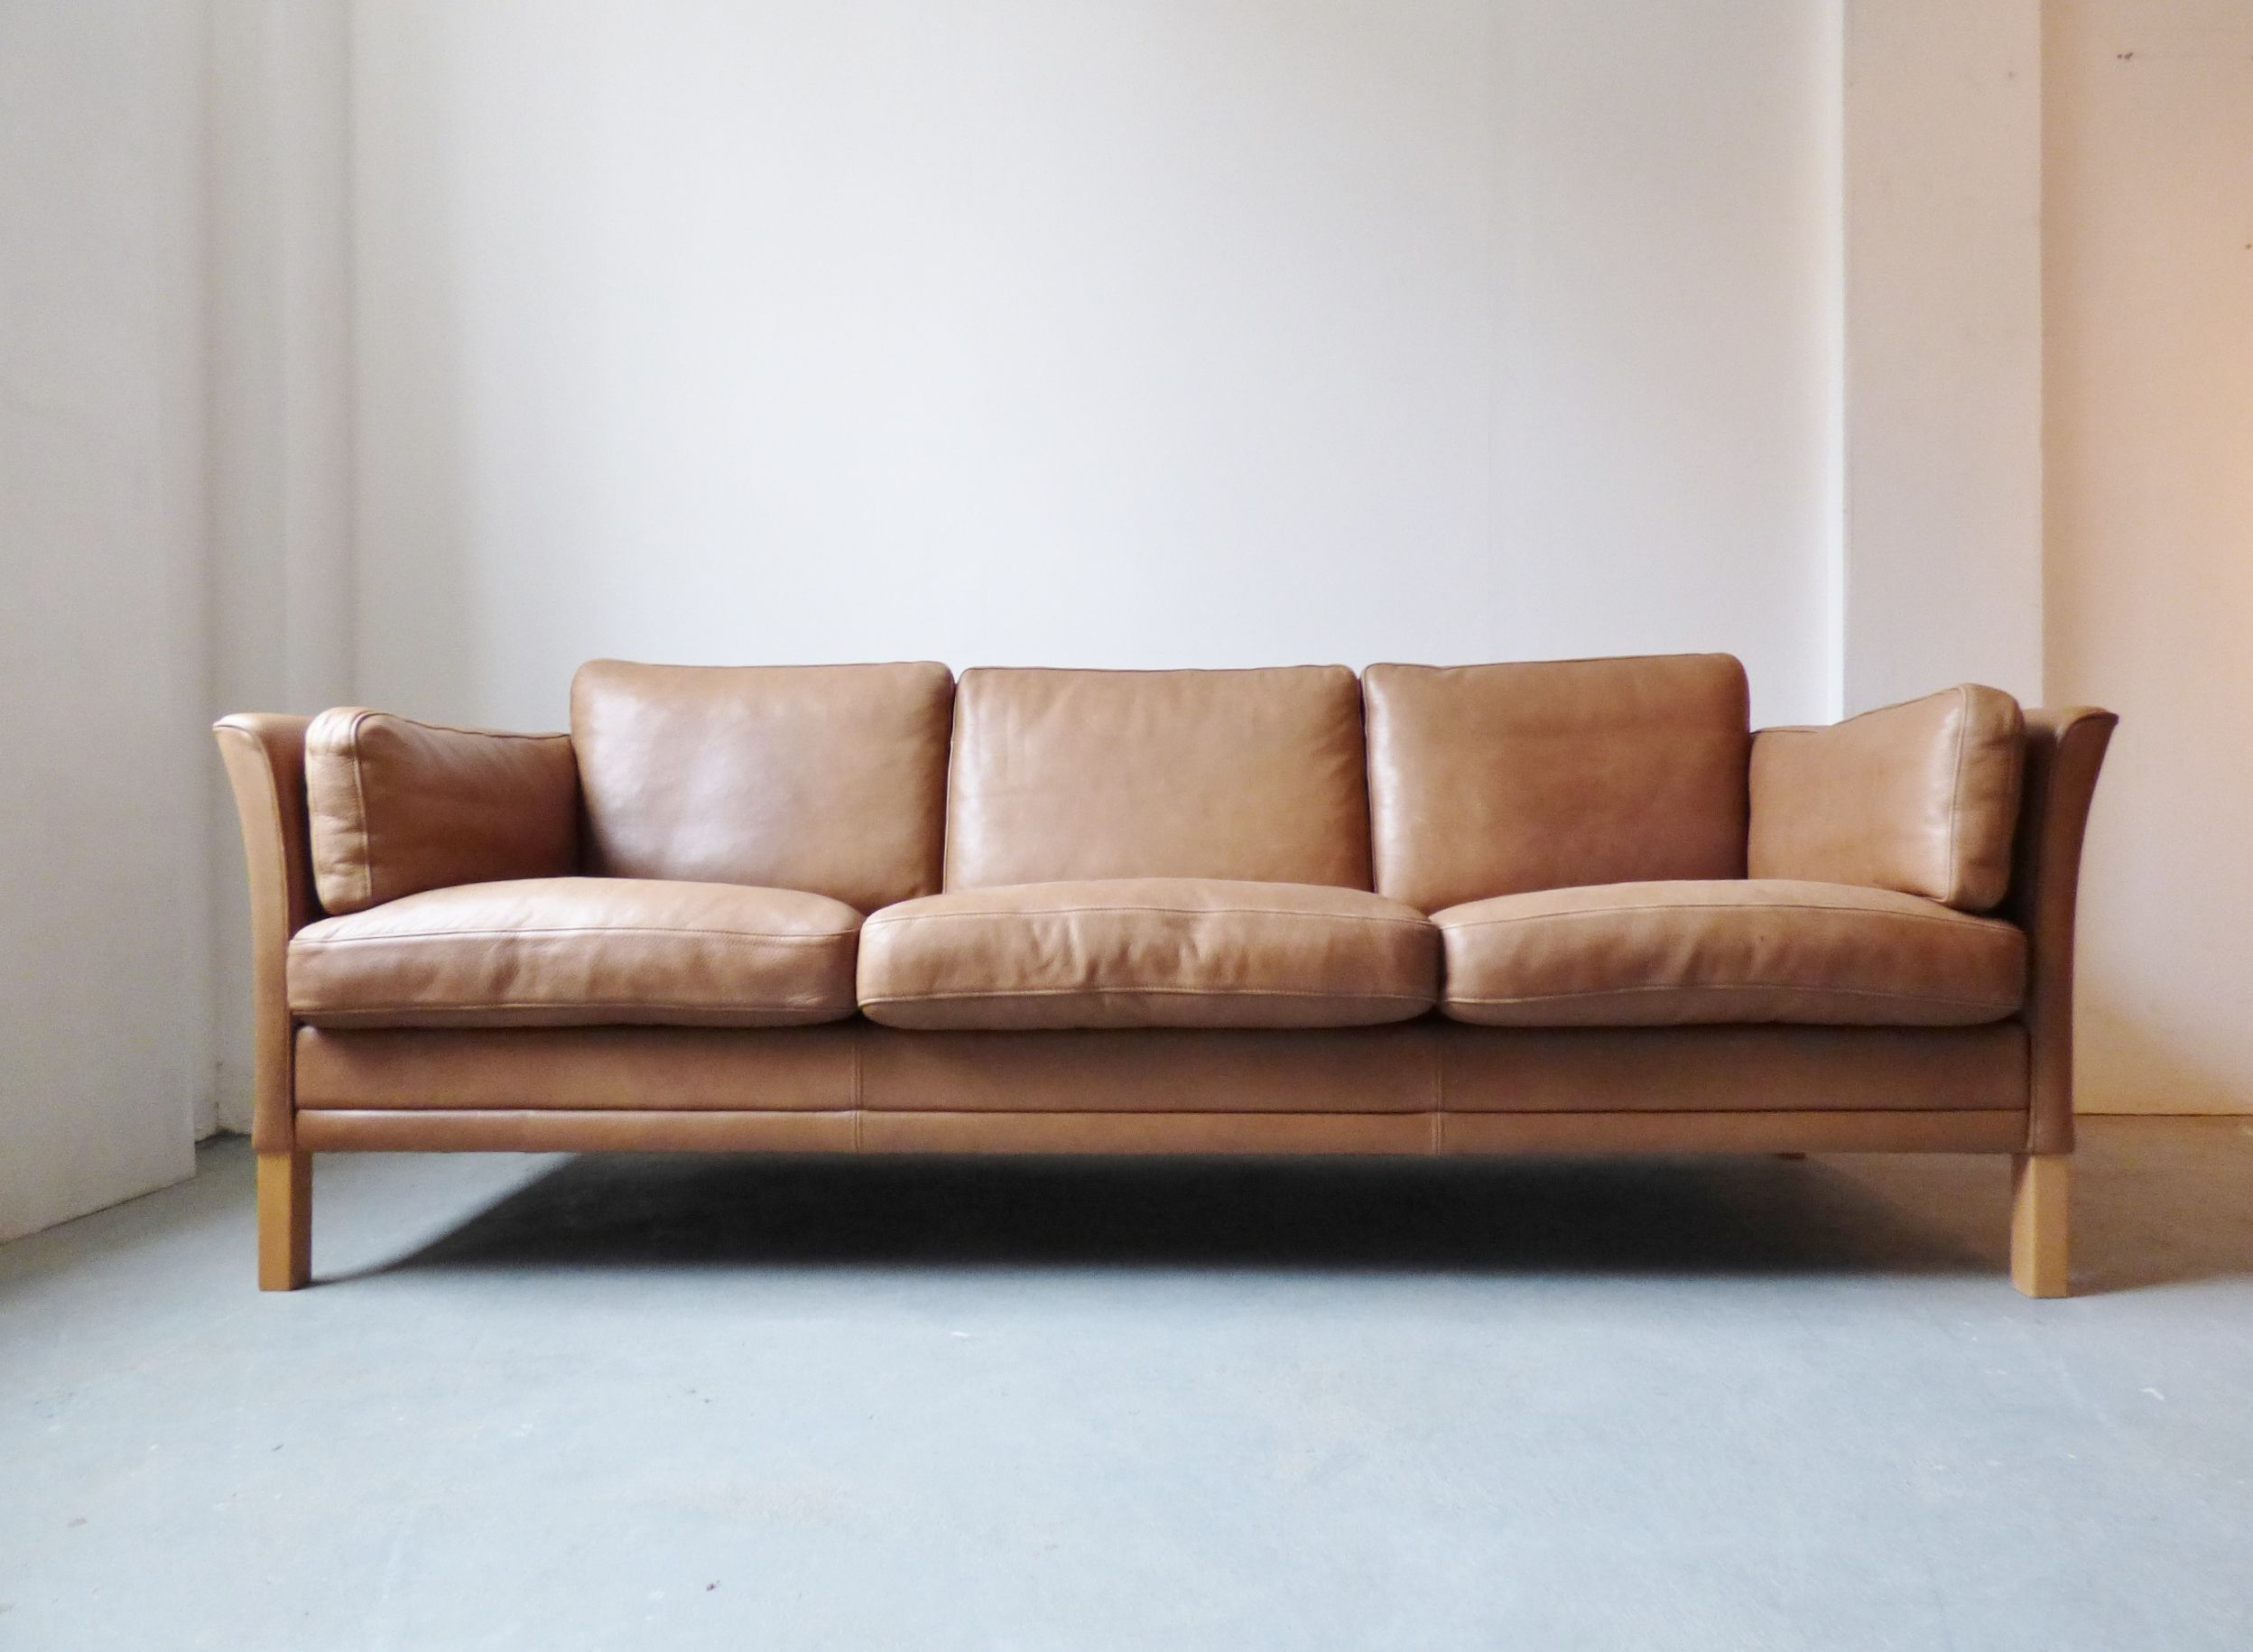 Vintage Danish tan leather 3 seater sofa lounge room